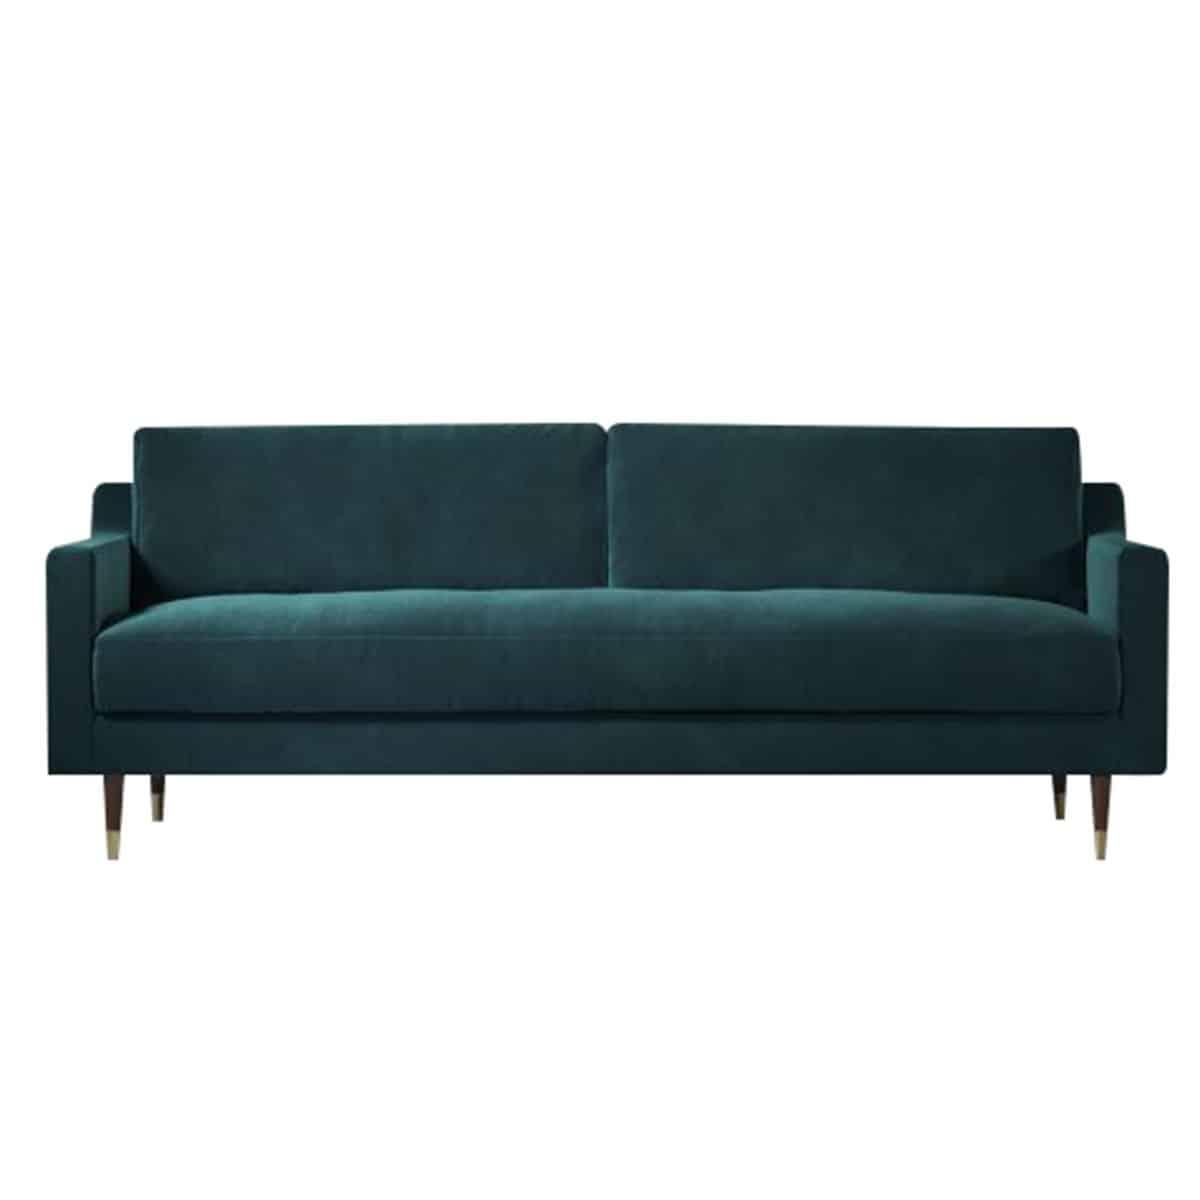 Dallas 3 Seater Sofa DeFrae Contract Furniture